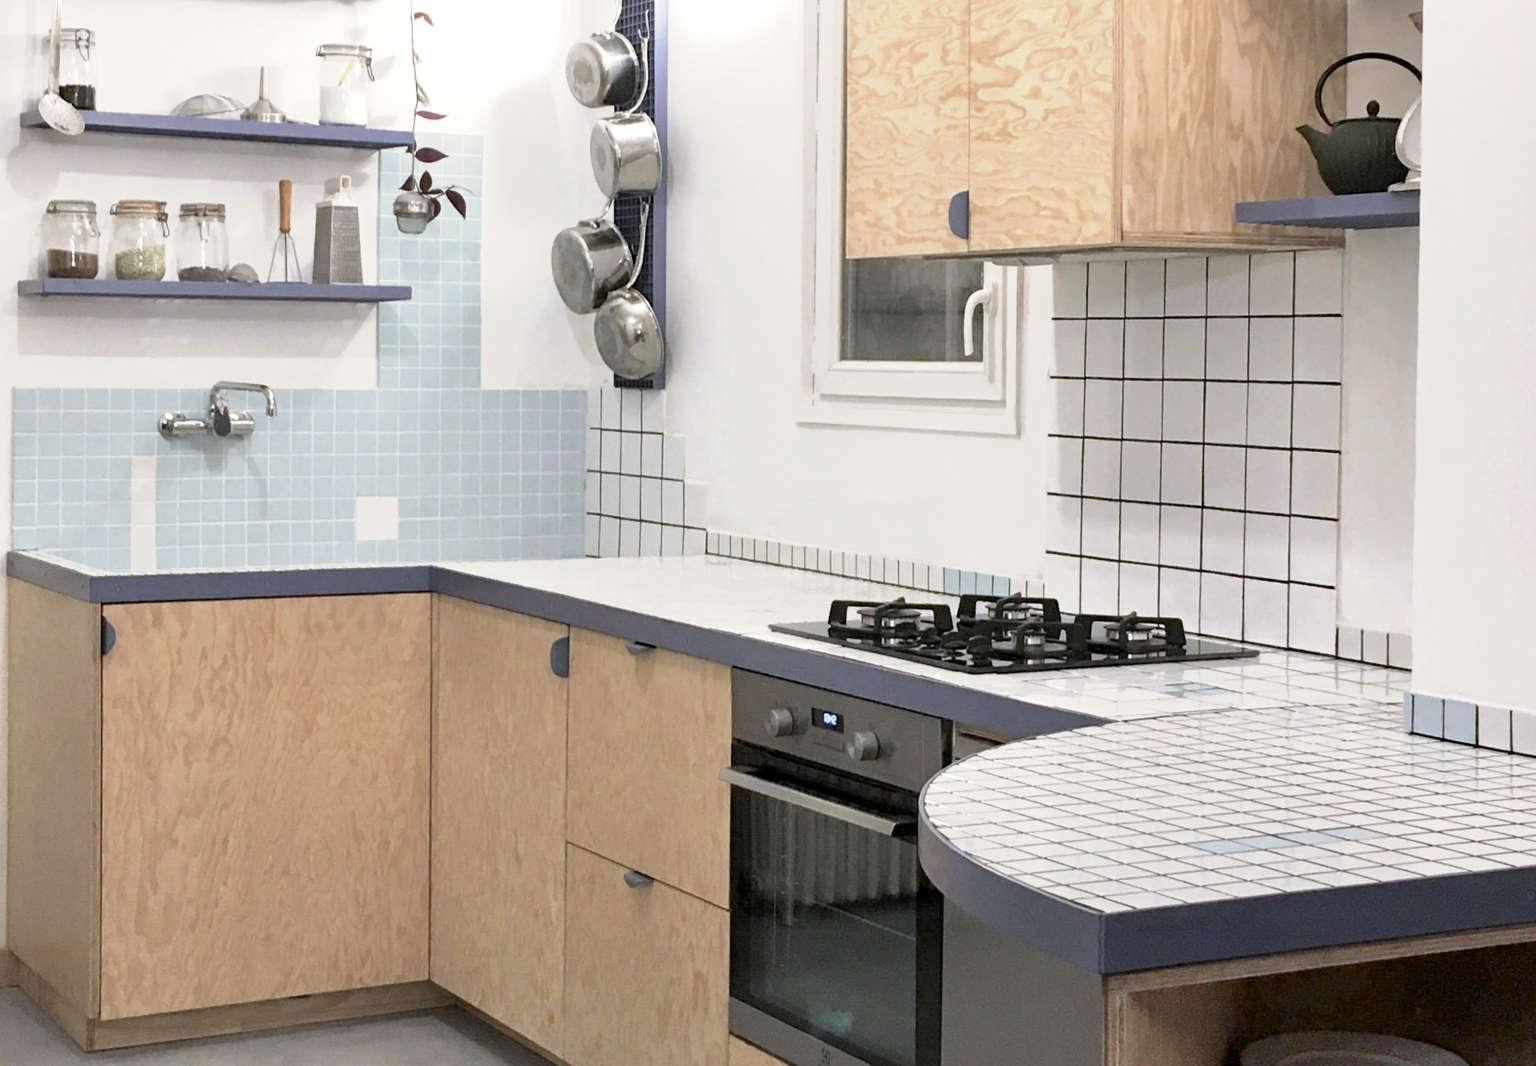 reclaimed tiles kitchen by 127af baptiste potier deborah feldman normandy france 1 1536x1066